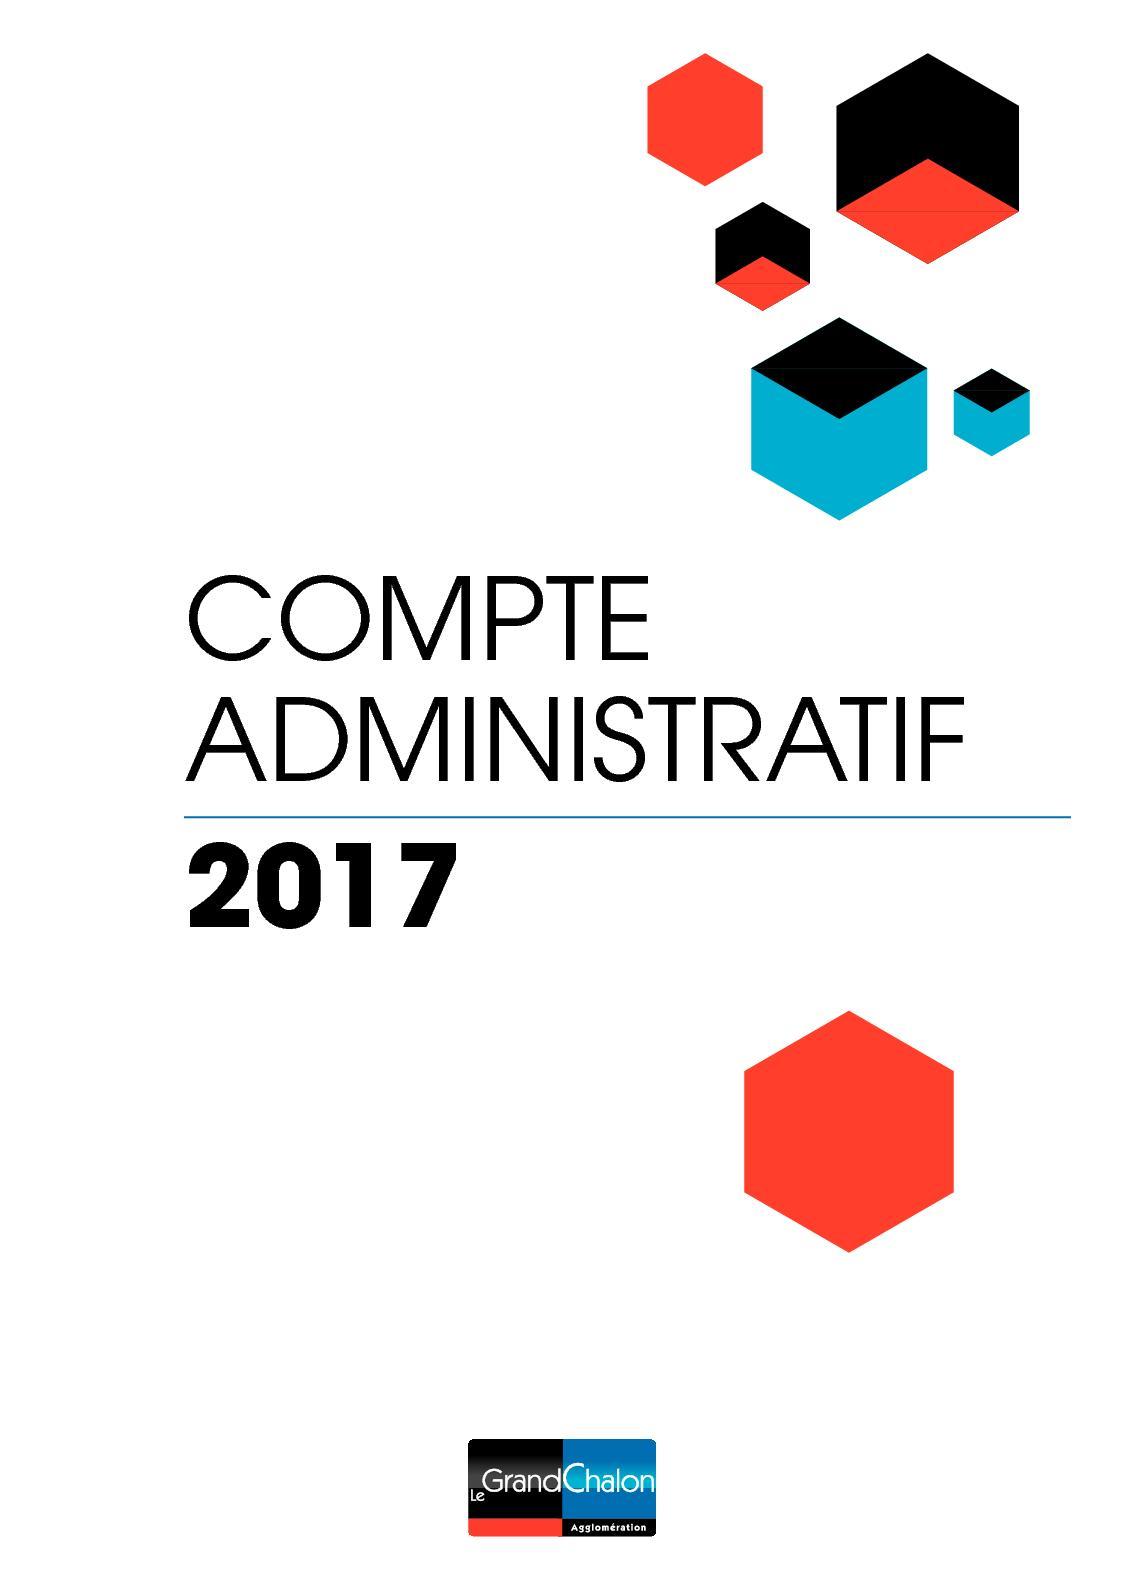 ADMINISTRATIF 2017 Calaméo ADMINISTRATIF ADMINISTRATIF COMPTE Calaméo 2017 COMPTE COMPTE Calaméo 2017 JF5lcu1TK3